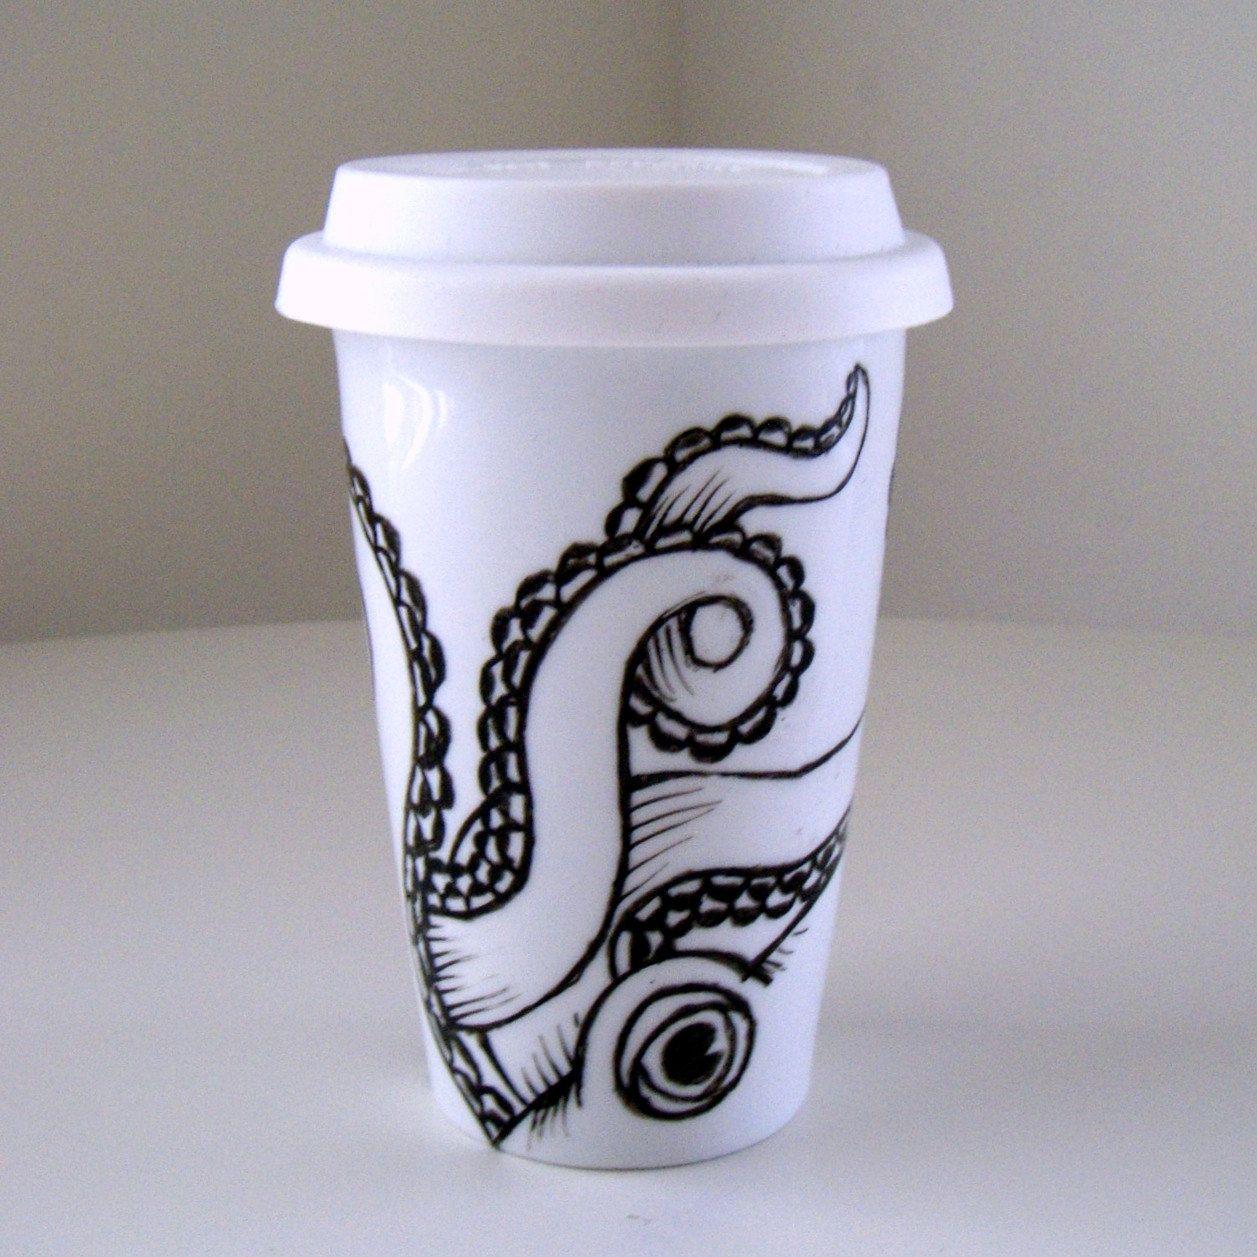 Octopus Ceramic Travel Mug Coffee In Style Starbucks Cup Art Mugs Coffee Cup Art